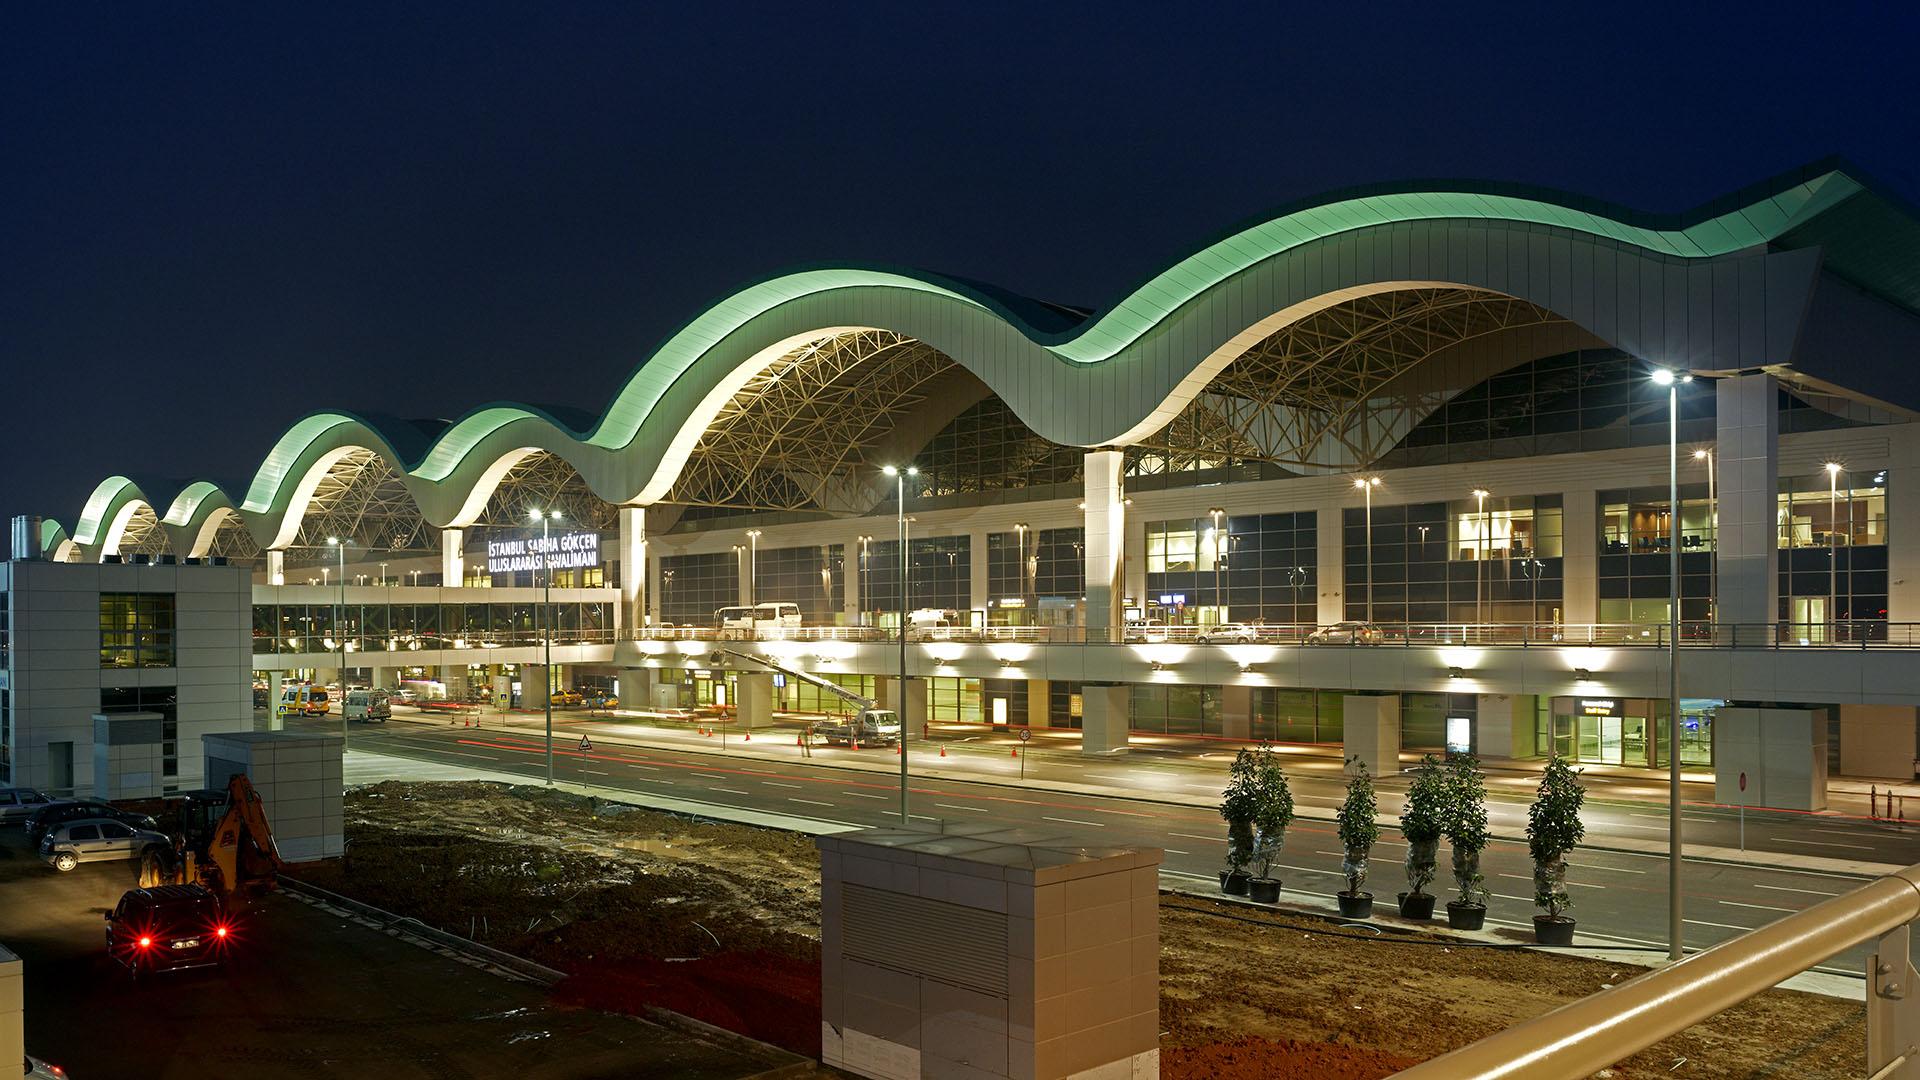 yeşil havaalanı